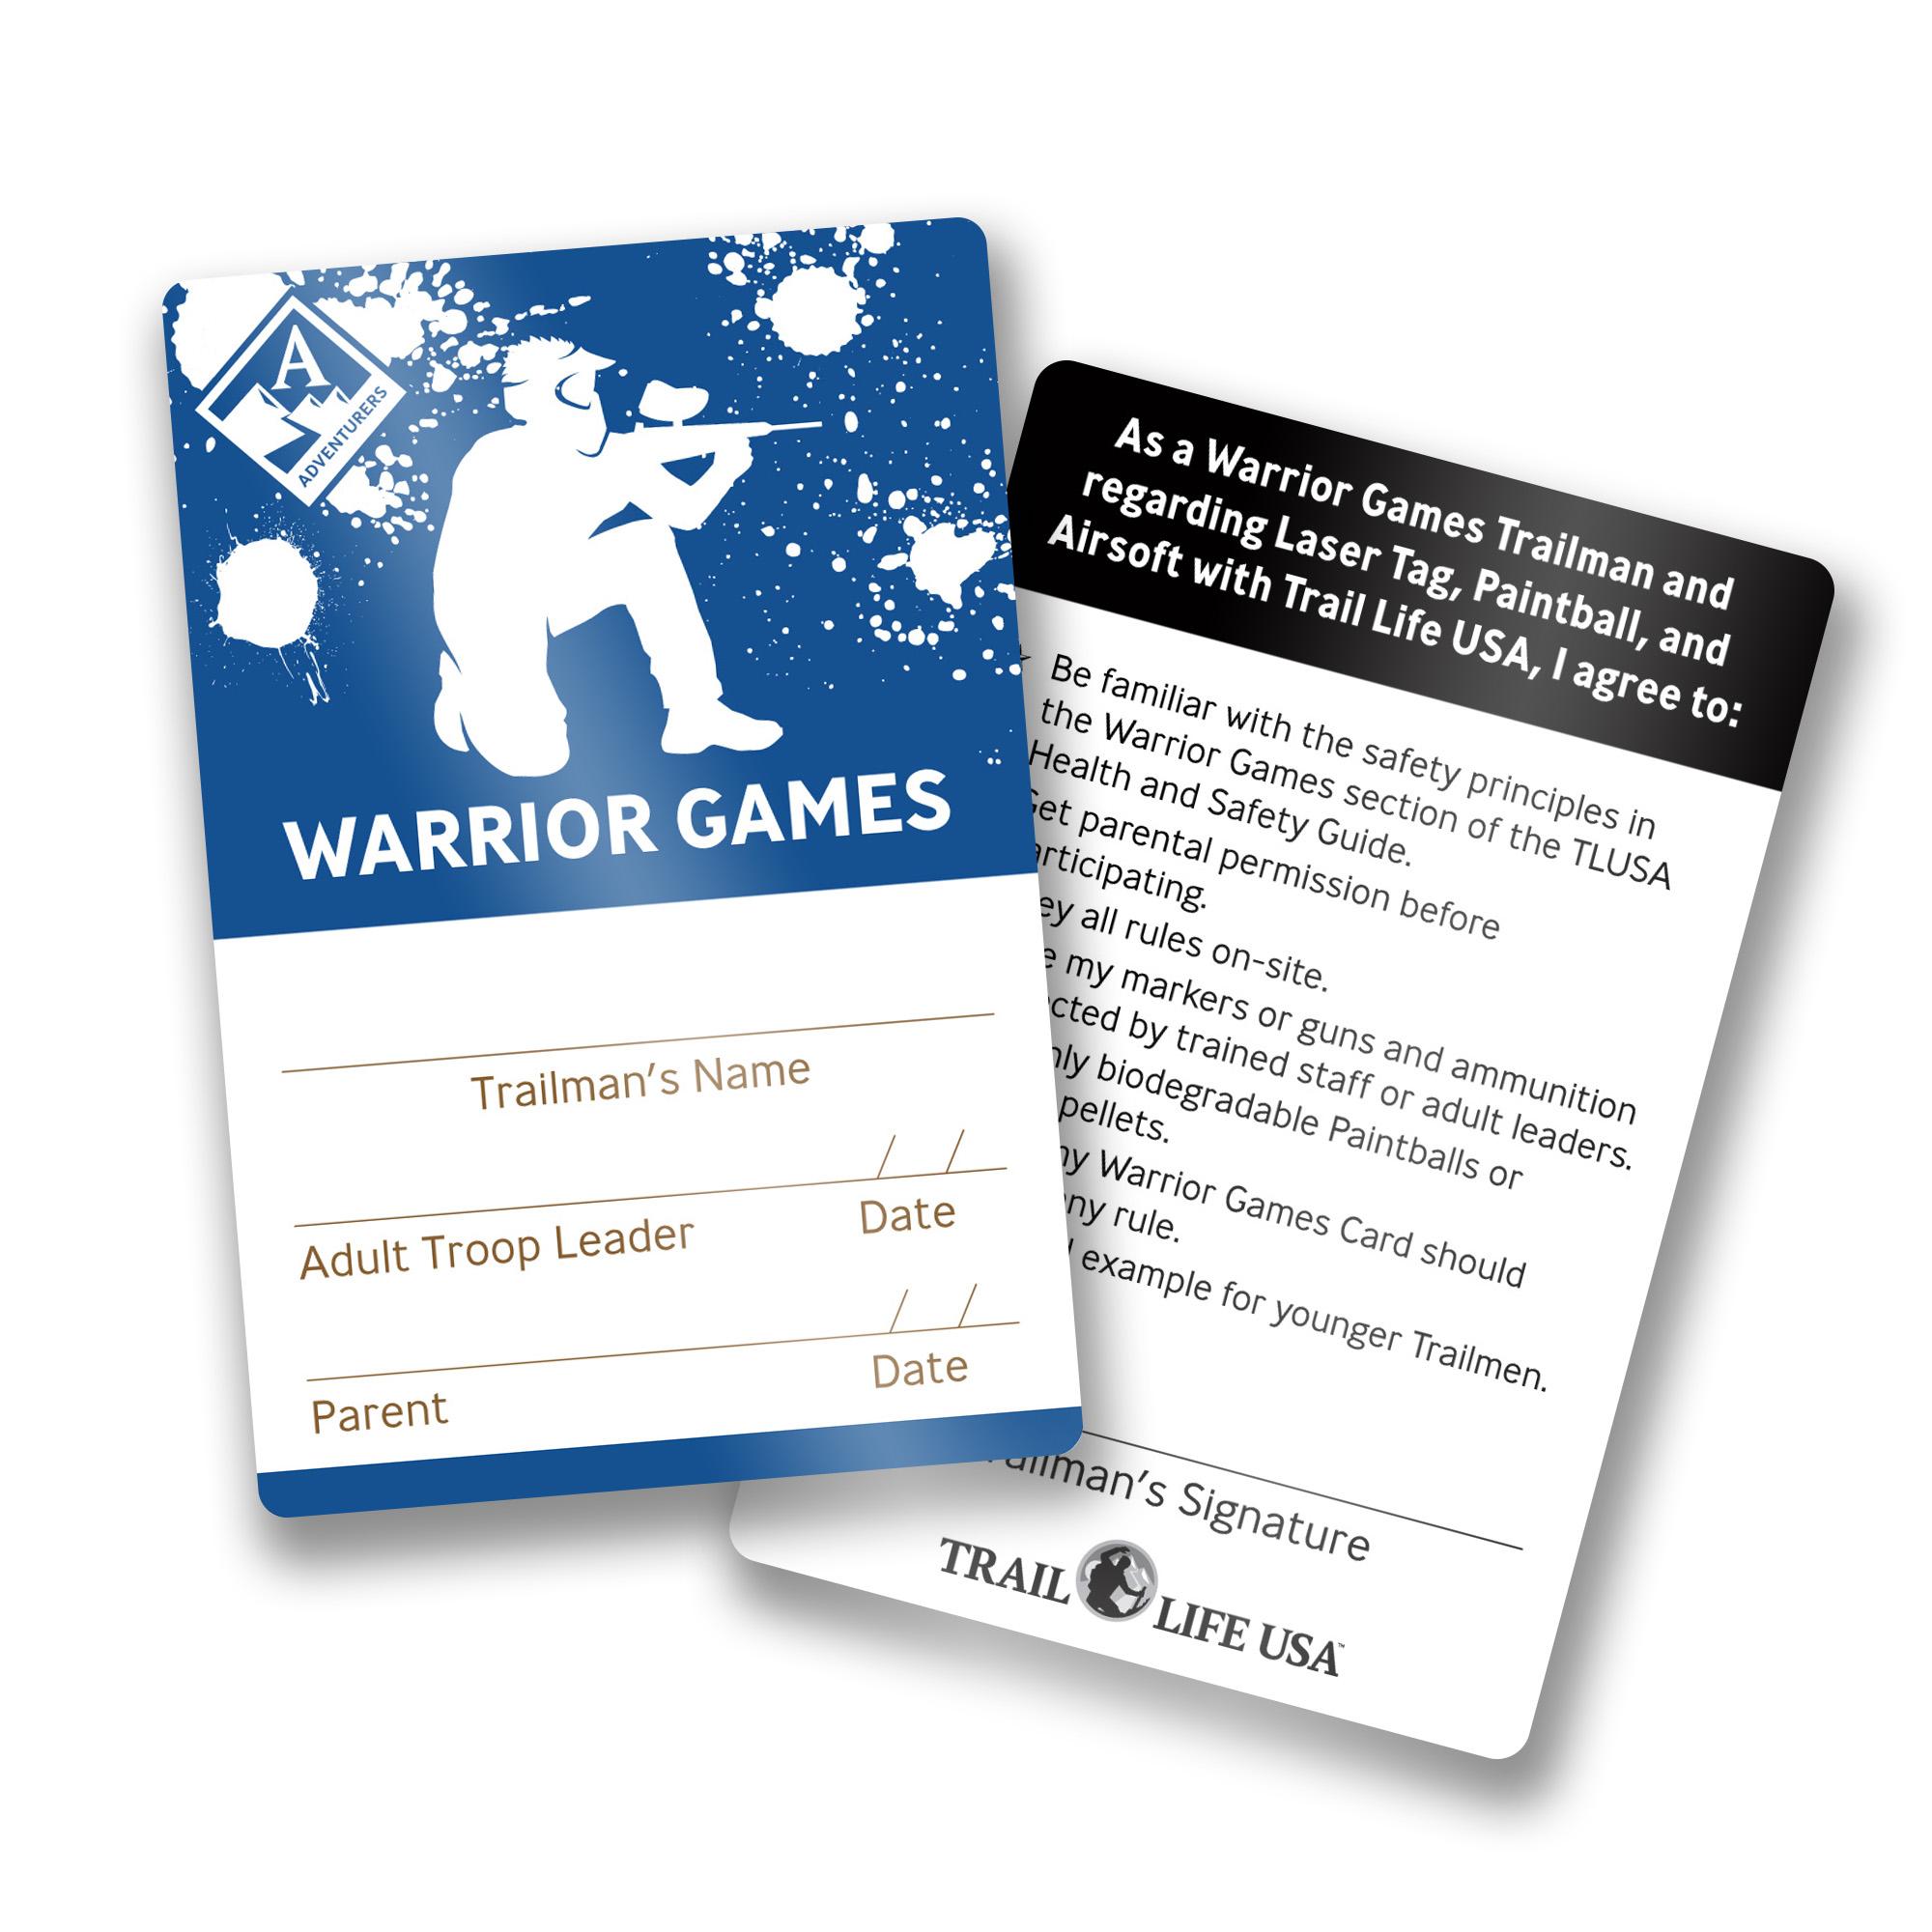 Adventurer Tracking Cards - Trail Life USA